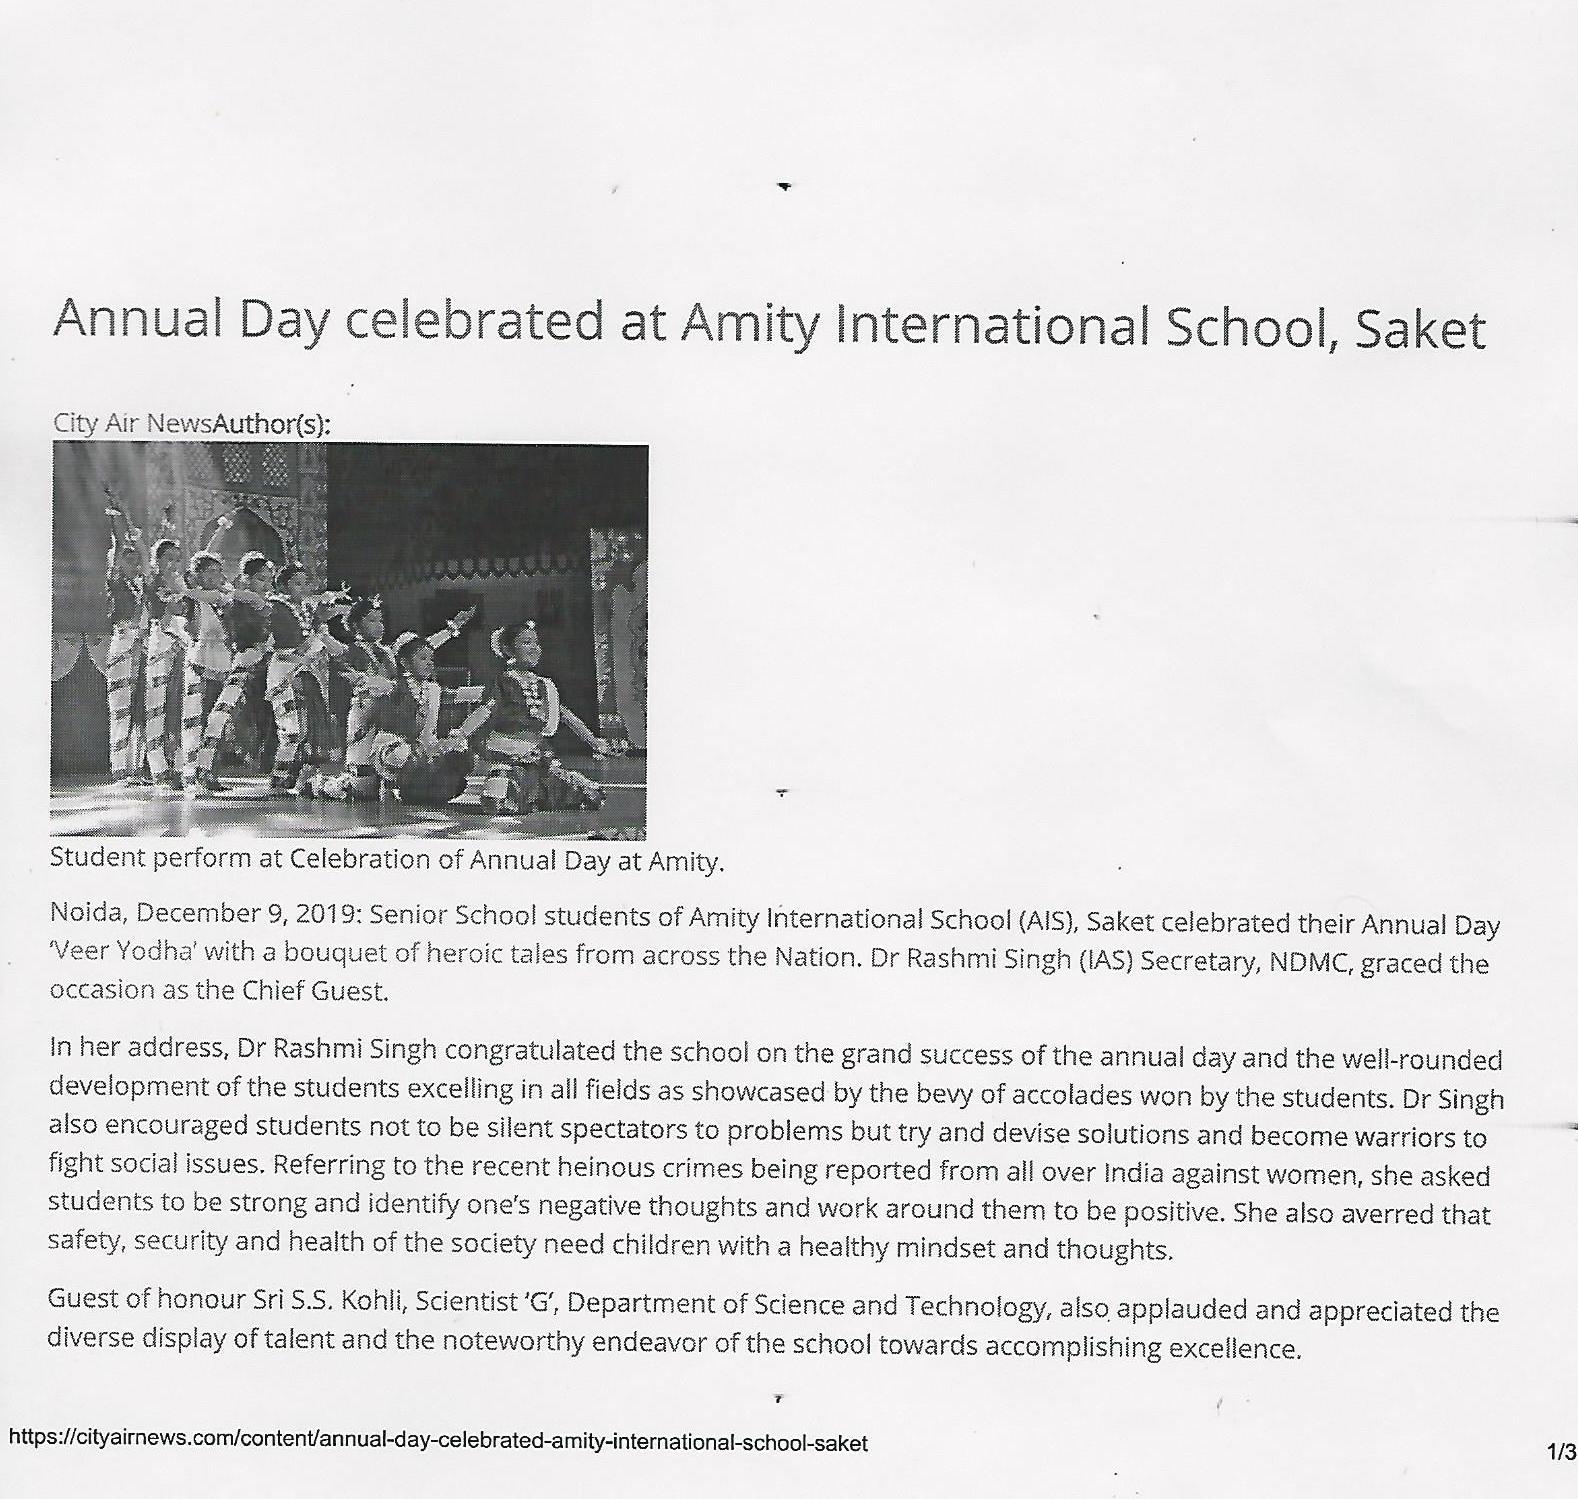 Amity International School Saket celebrates Annual Day - Amity Events